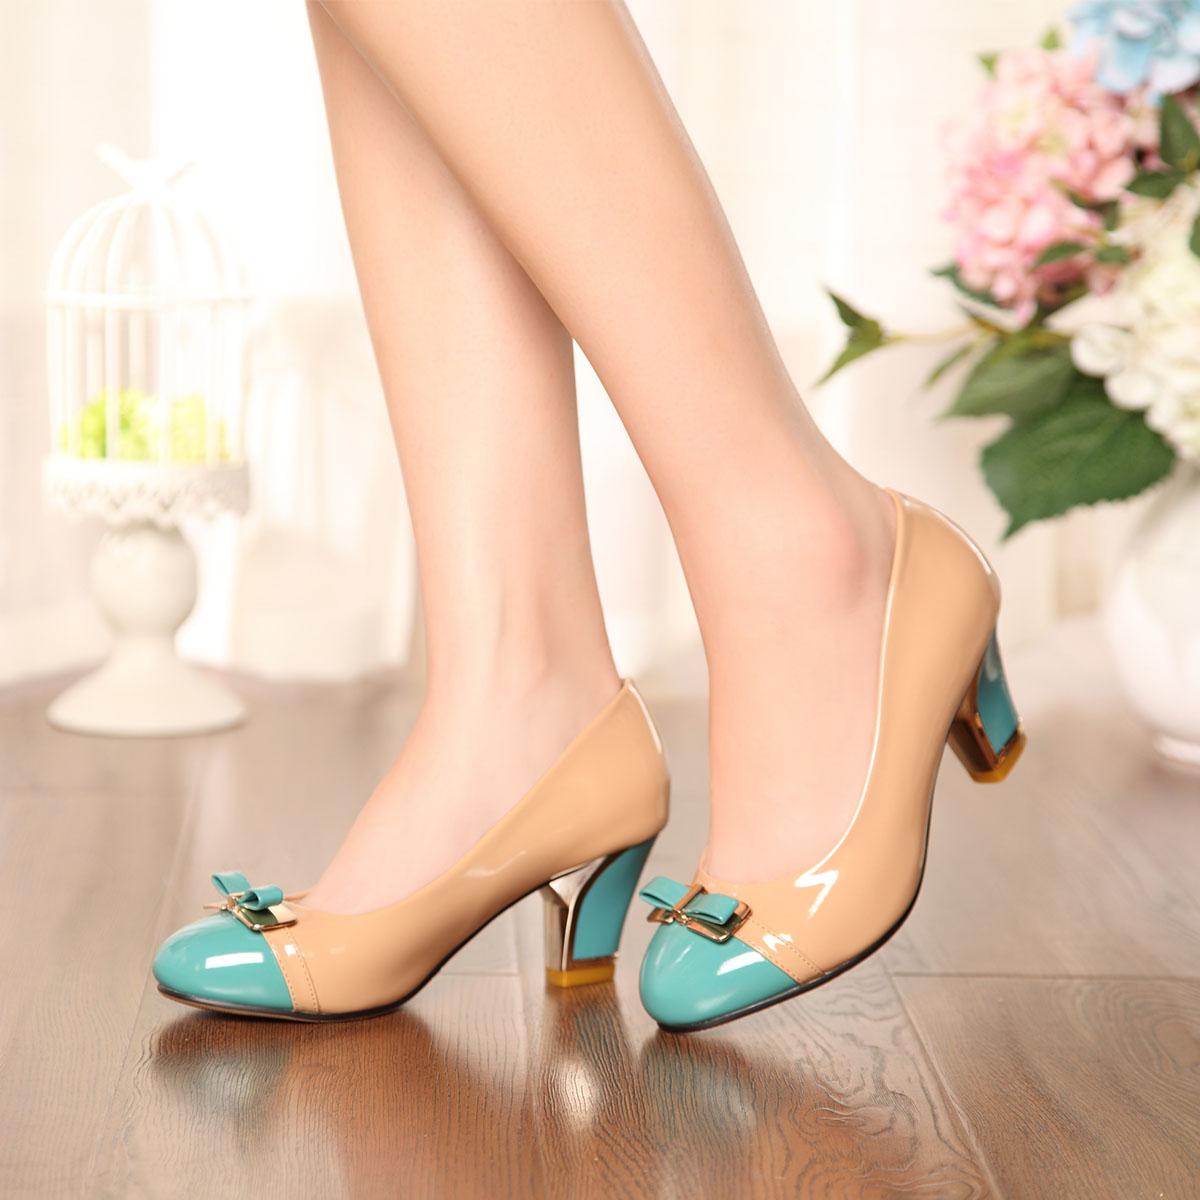 karoe卡罗尔时尚新款女鞋单鞋套脚 pu粗跟职业女鞋夏舒适6659